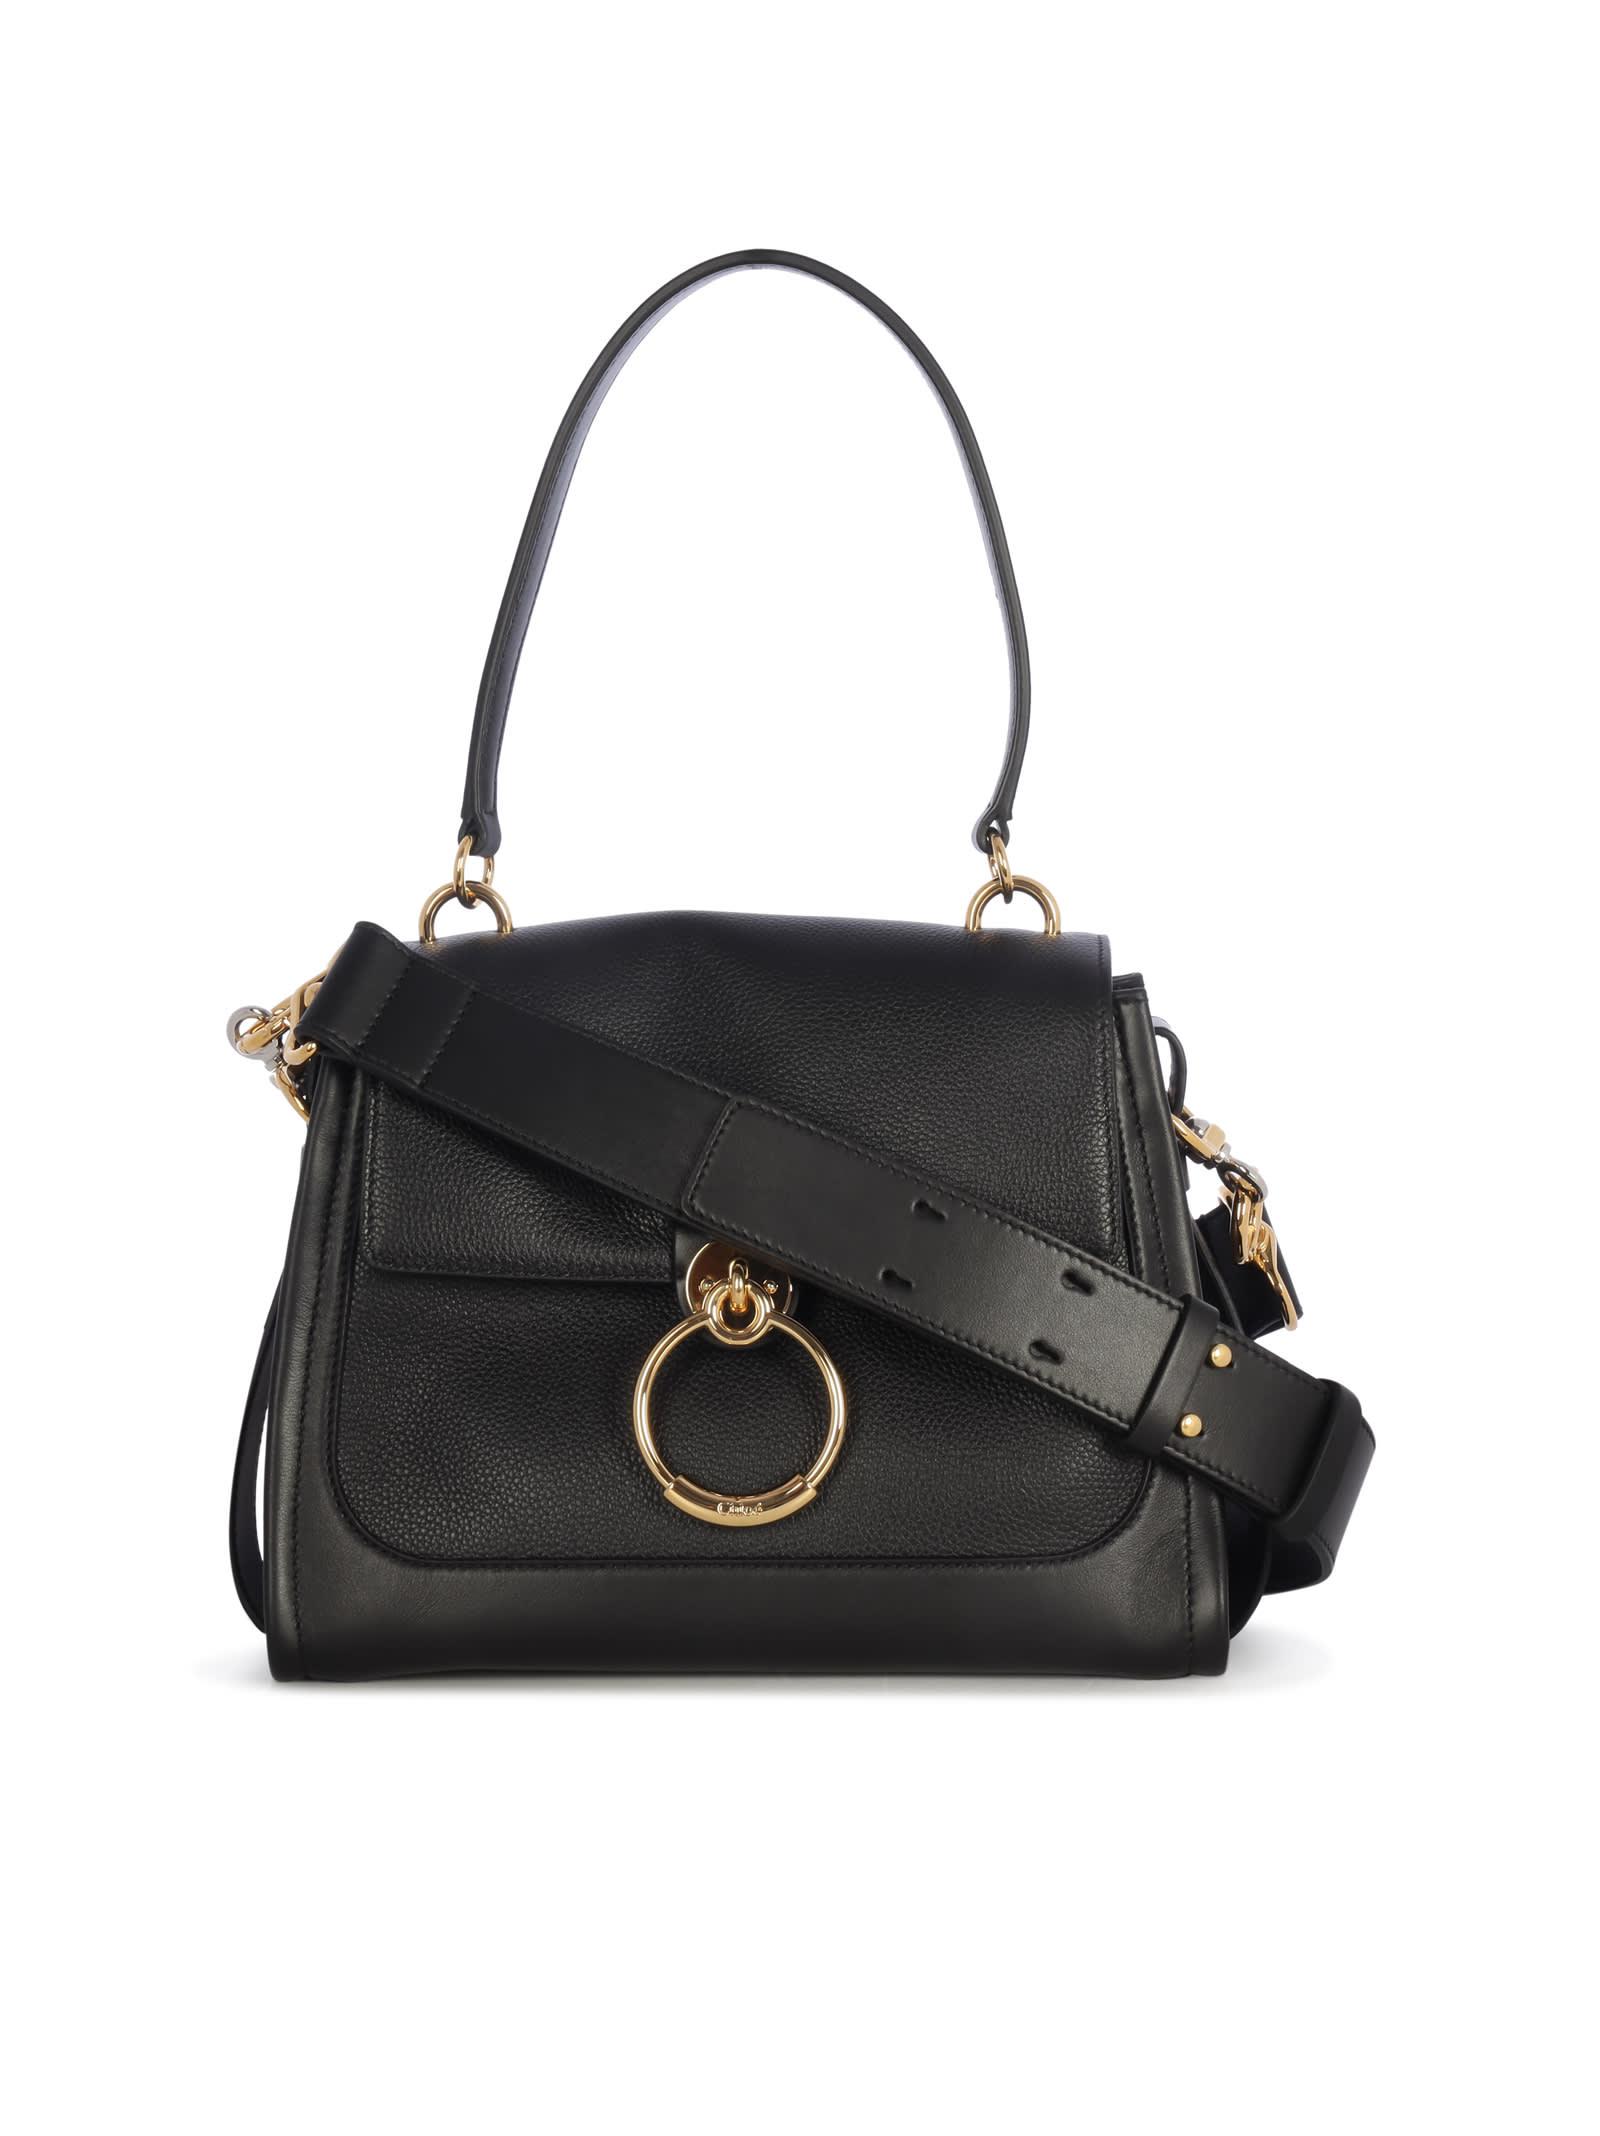 Chloé Tess Shiny Calf from ChloéComposition: 100% Leather